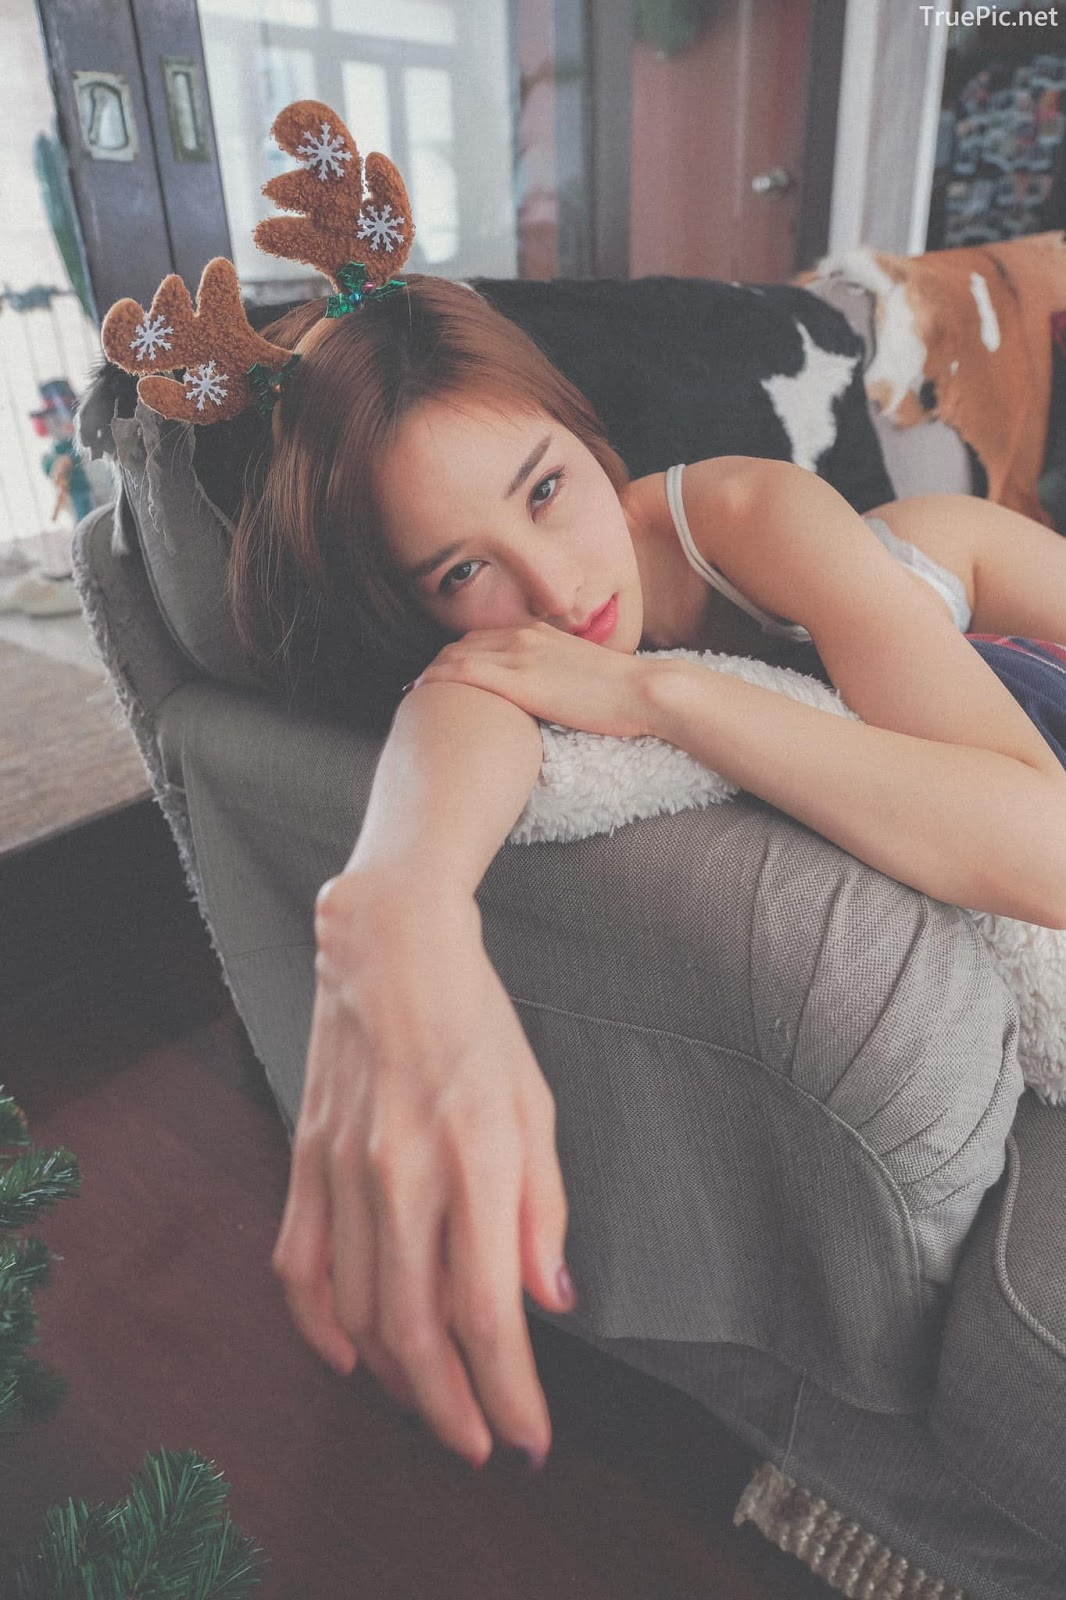 Thailand sexy model Arys Nam-in (Arysiacara) – Sexy santy girl - Picture 8